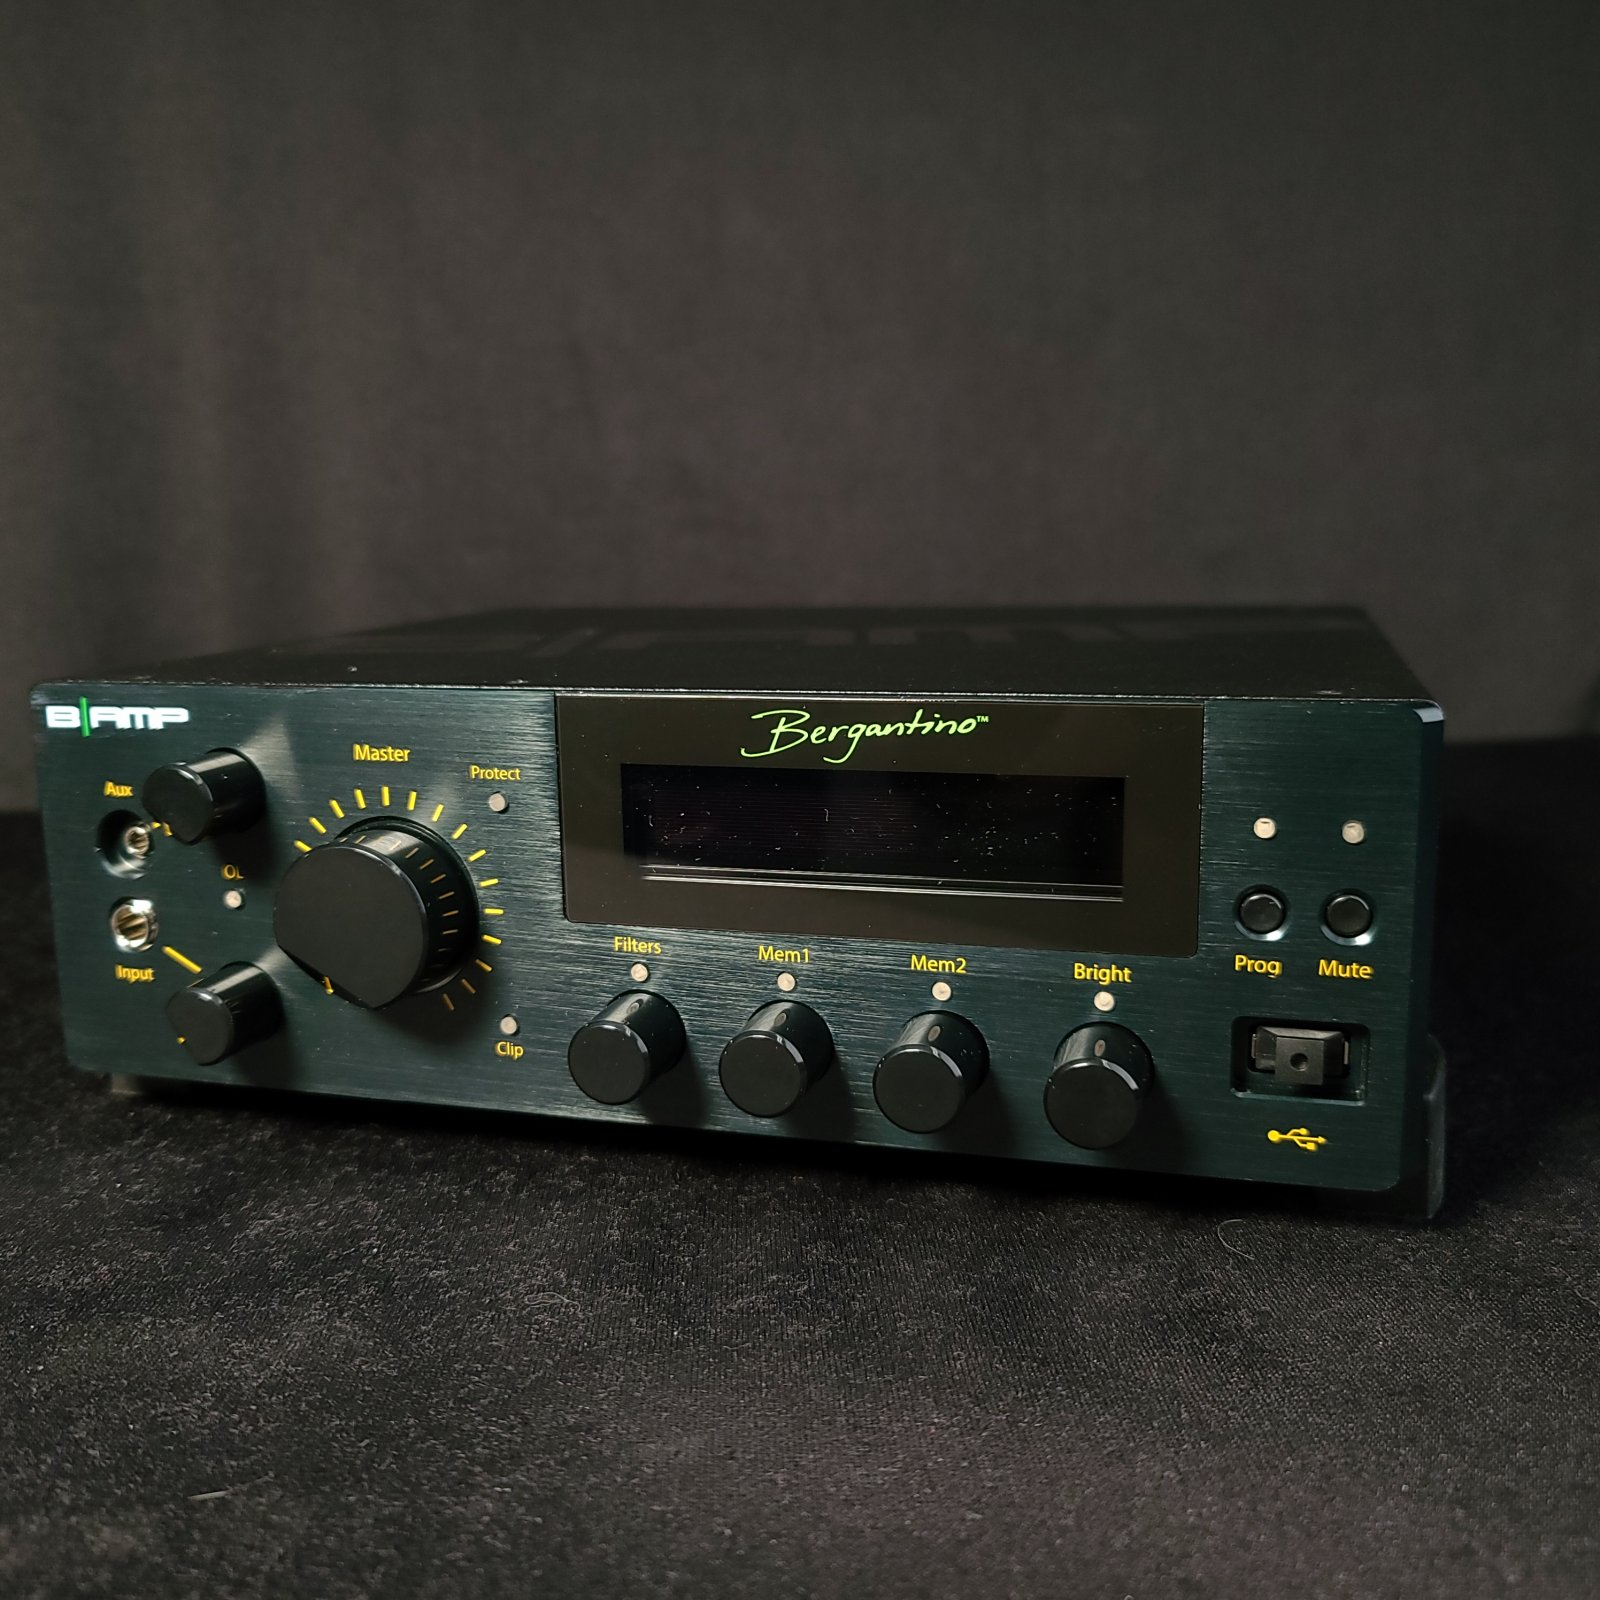 Bergantino B-Amp 700 Watt Digital Bass Amplifier Updated Display Screen 2021